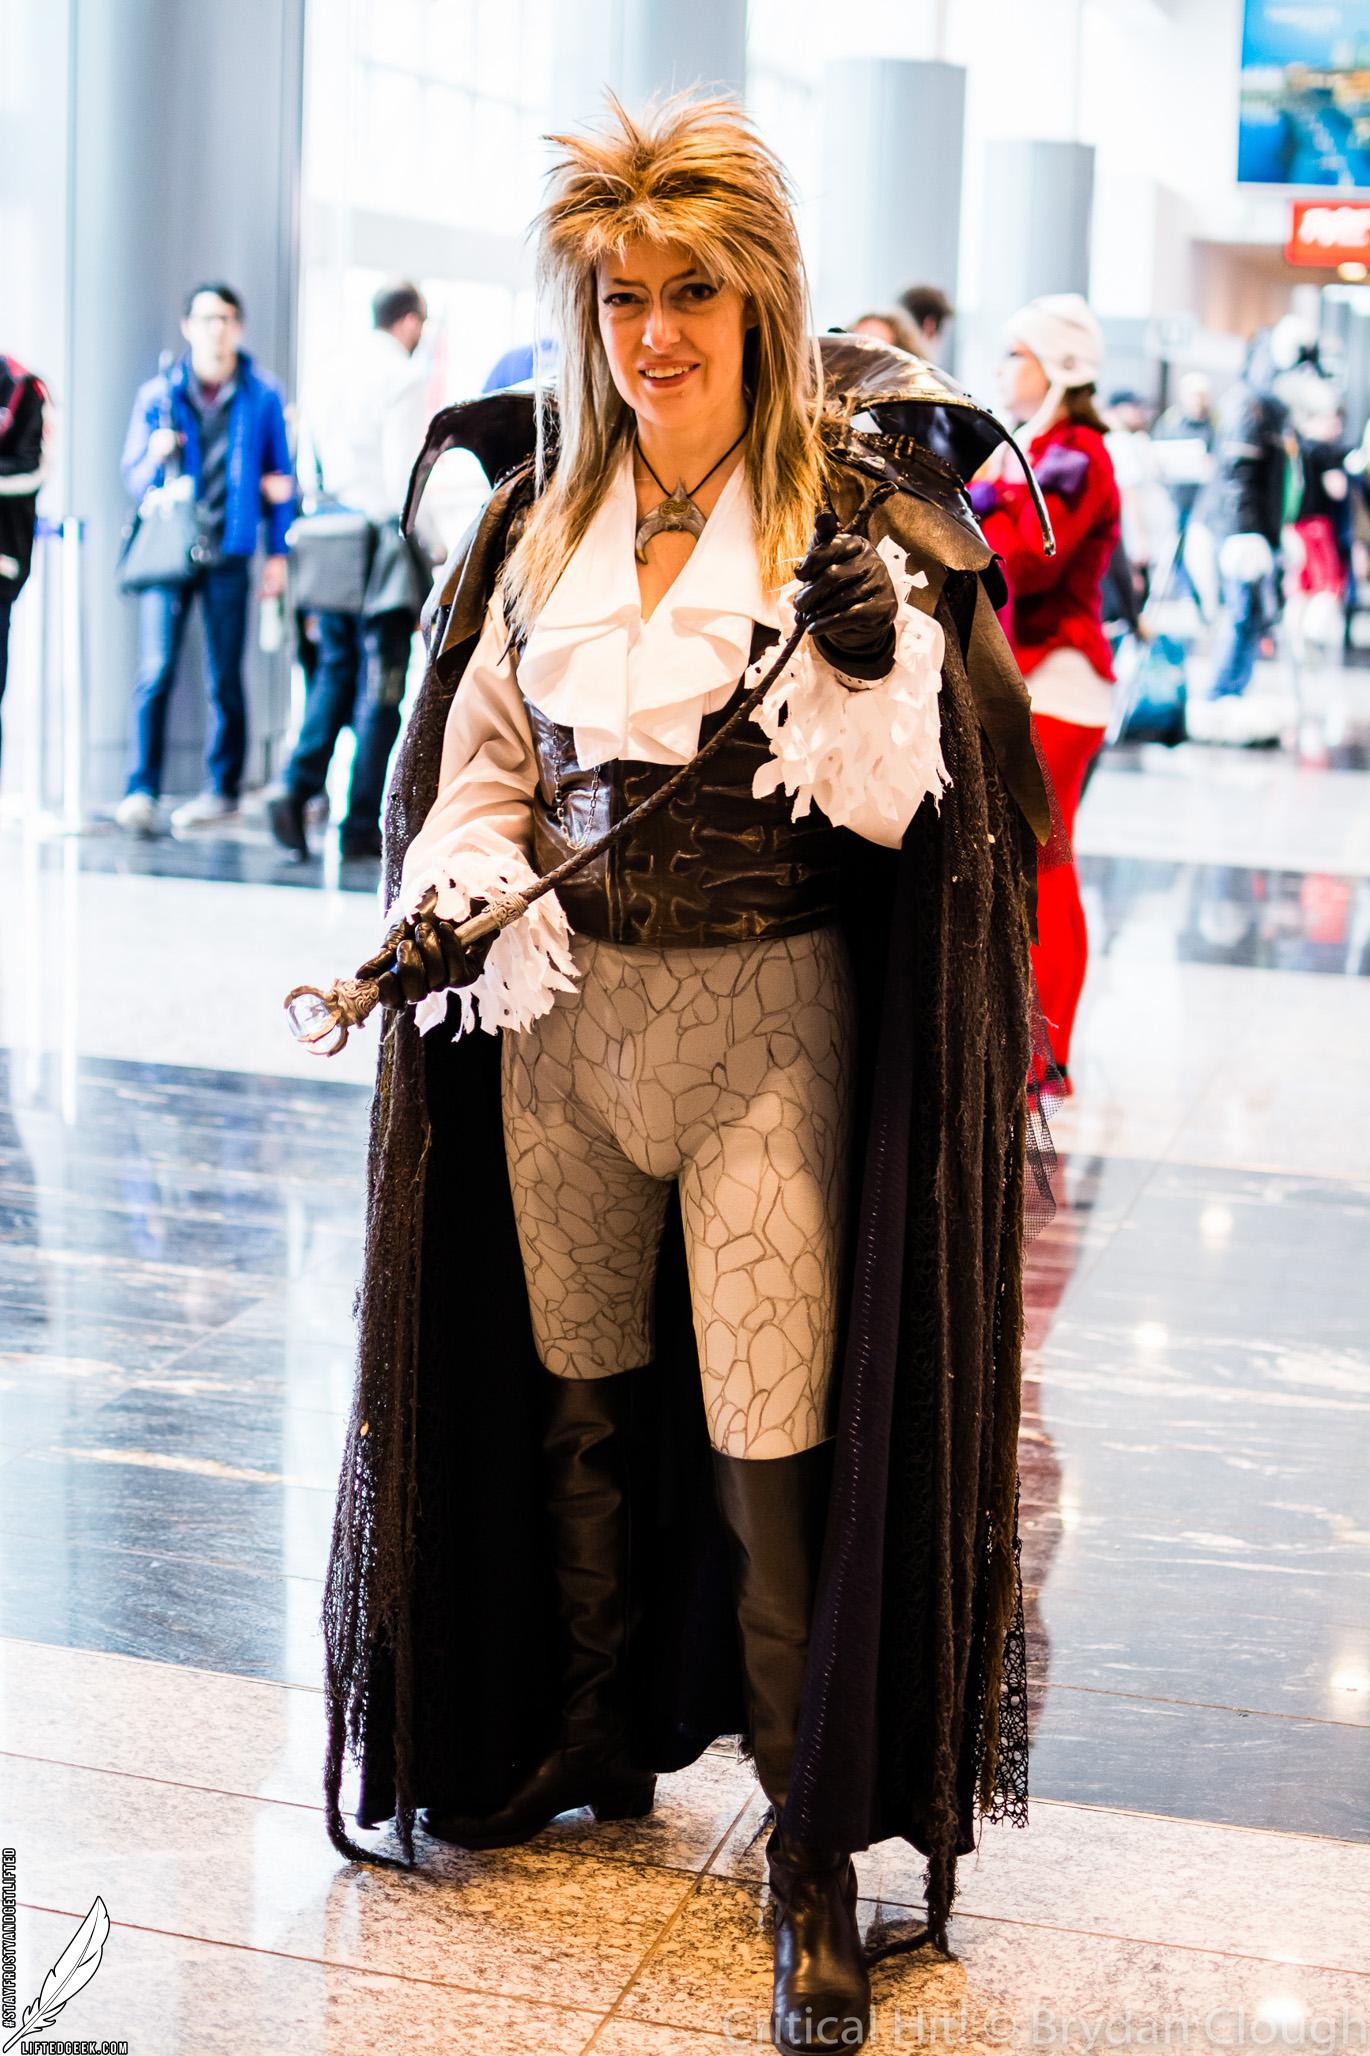 halloween expo cosplay contest 2016-81.jpg